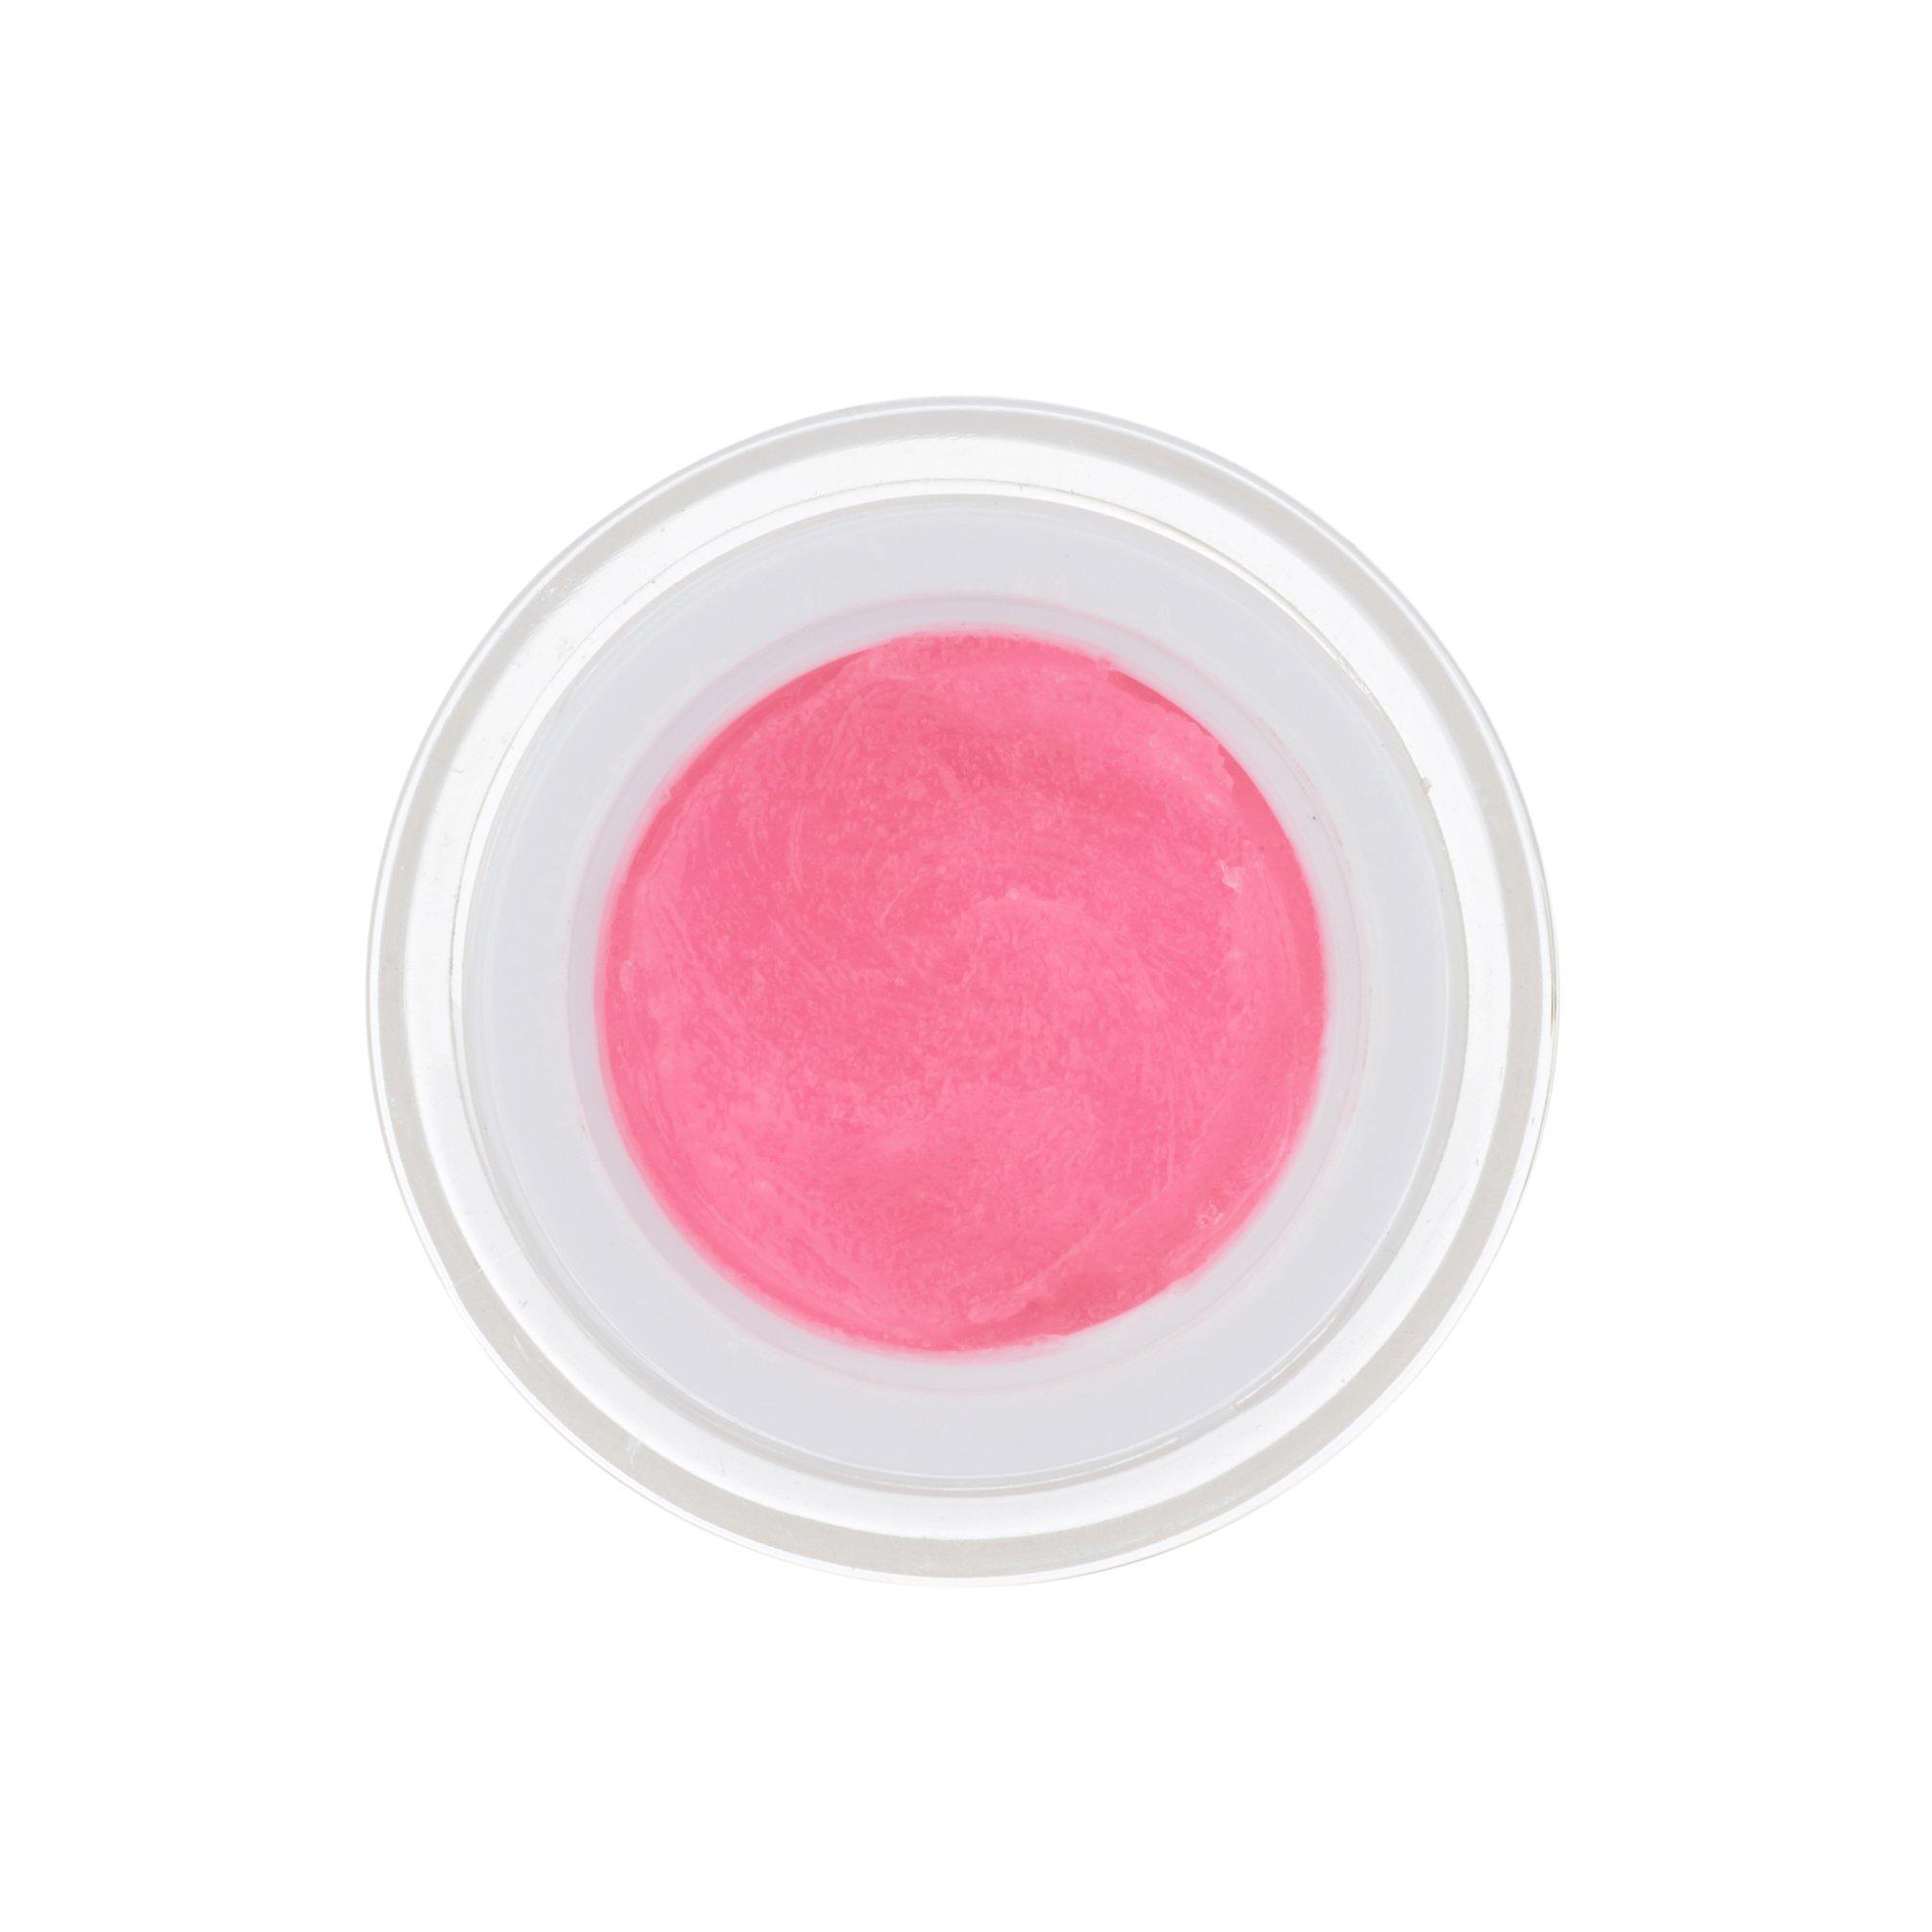 Yoghurt Sugar Lip Balm Scrub Exfoliator Extract Yogurt for dry lip - the Balm treatment with Sugar scruber + Hydrolysed Collagen and Vitamin C (0.35oz) by Juicy Skin Care (Image #4)